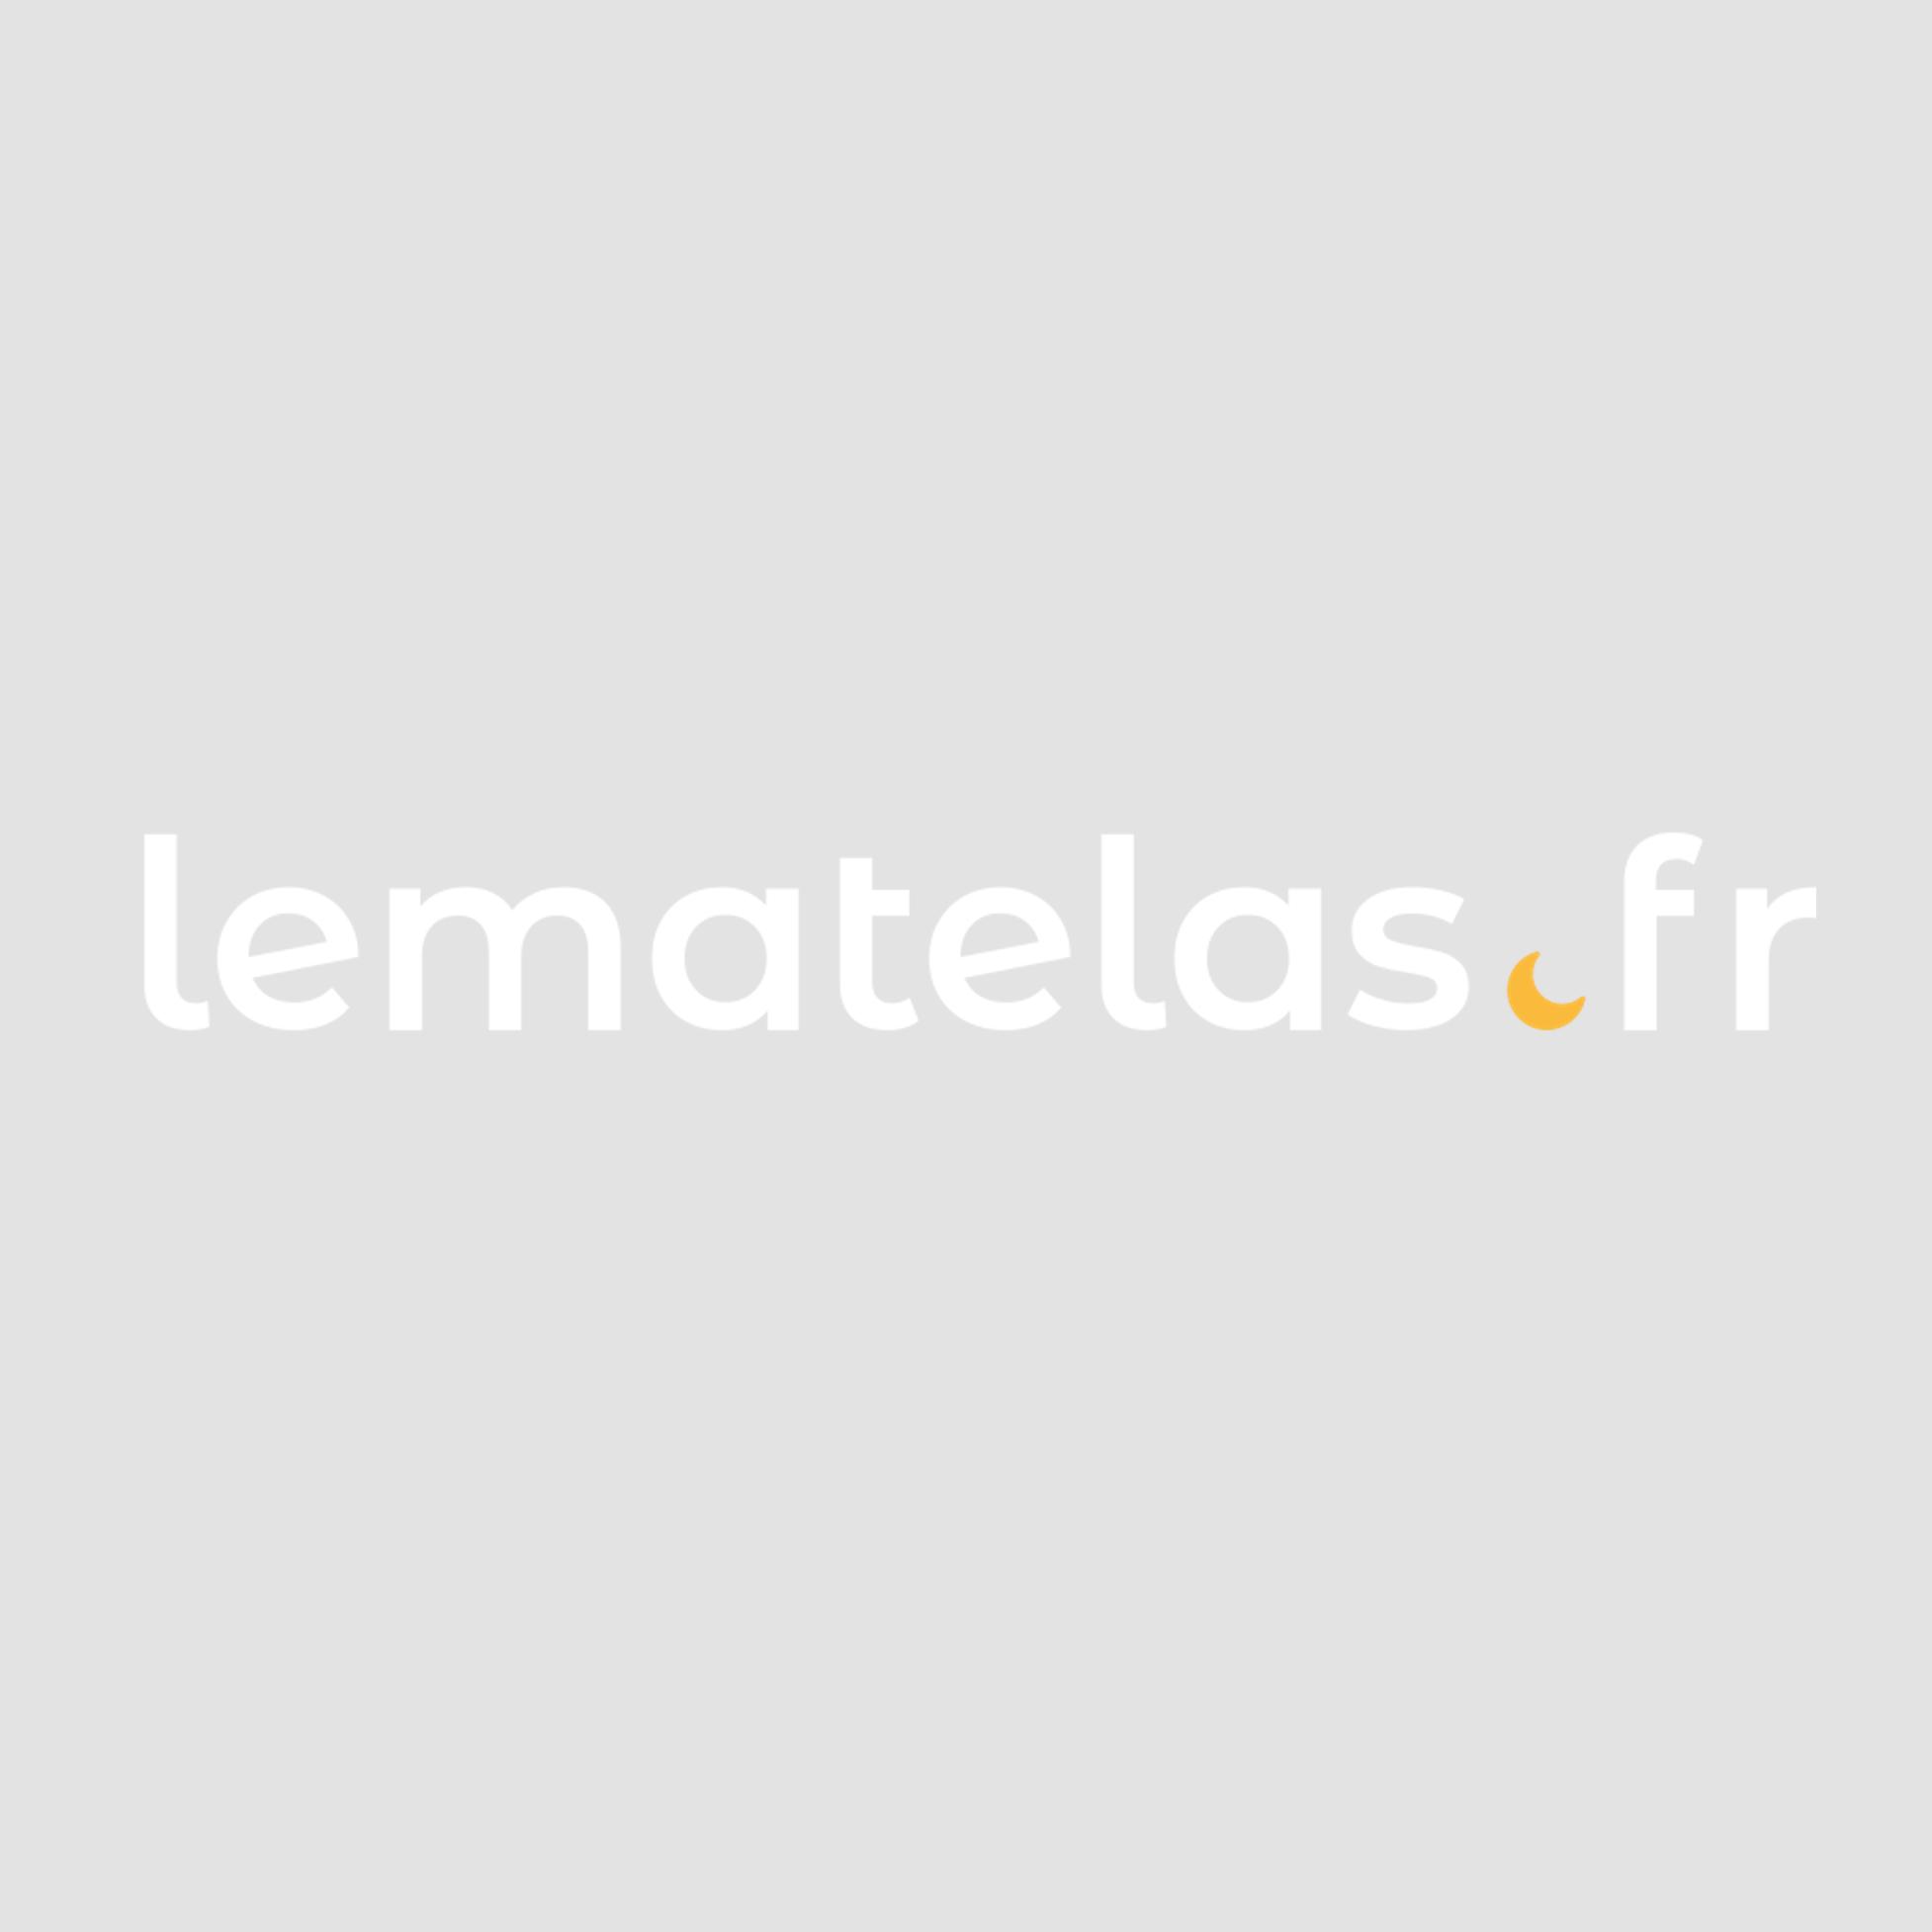 Tapis de jeu enfant maison 130x200 - TA2002